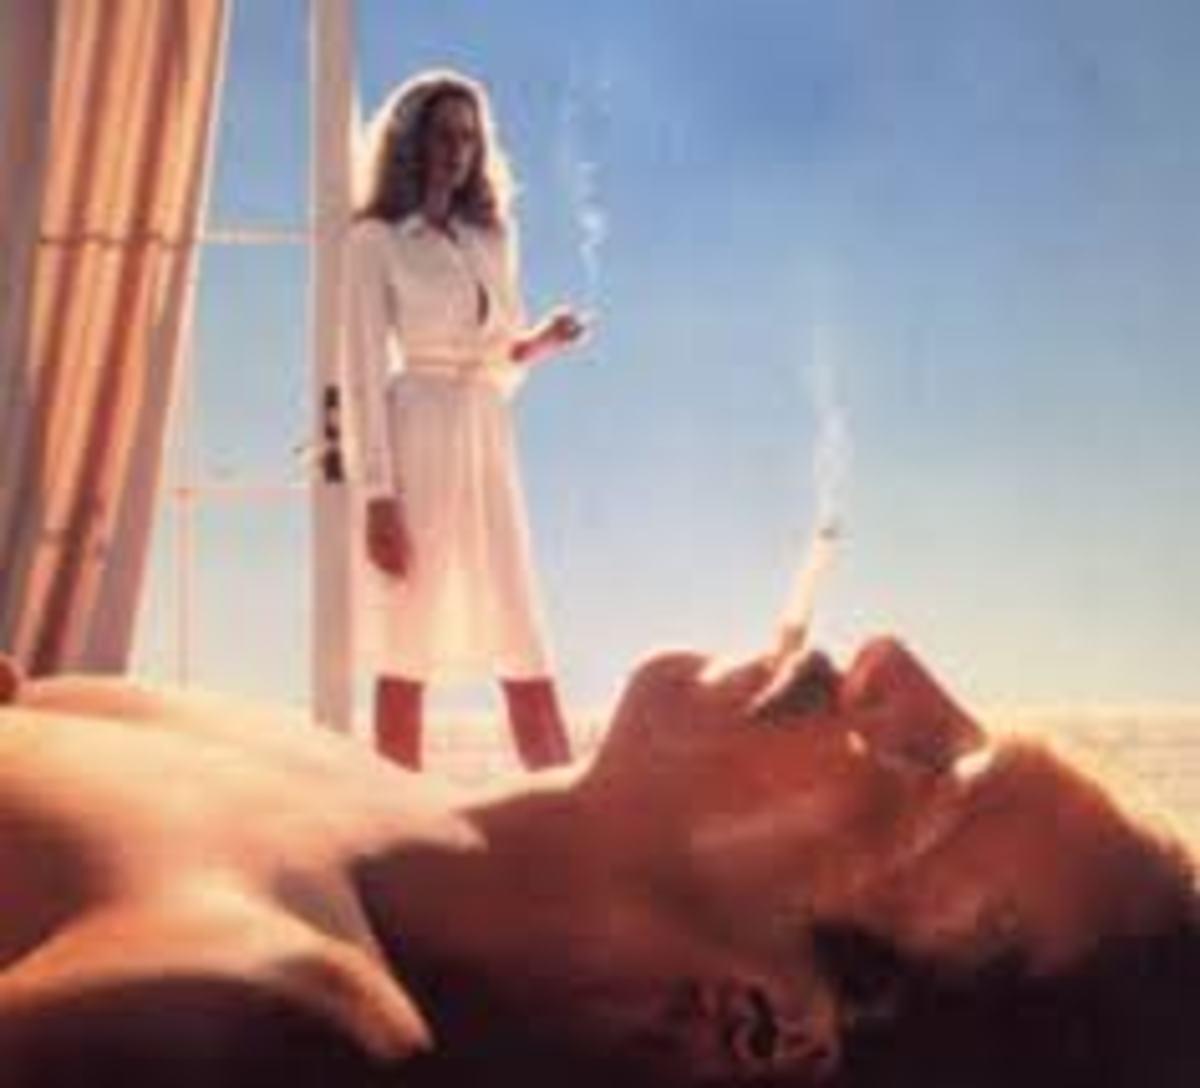 Kathleen Turner and William Hurt's mustache in BODY HEAT.